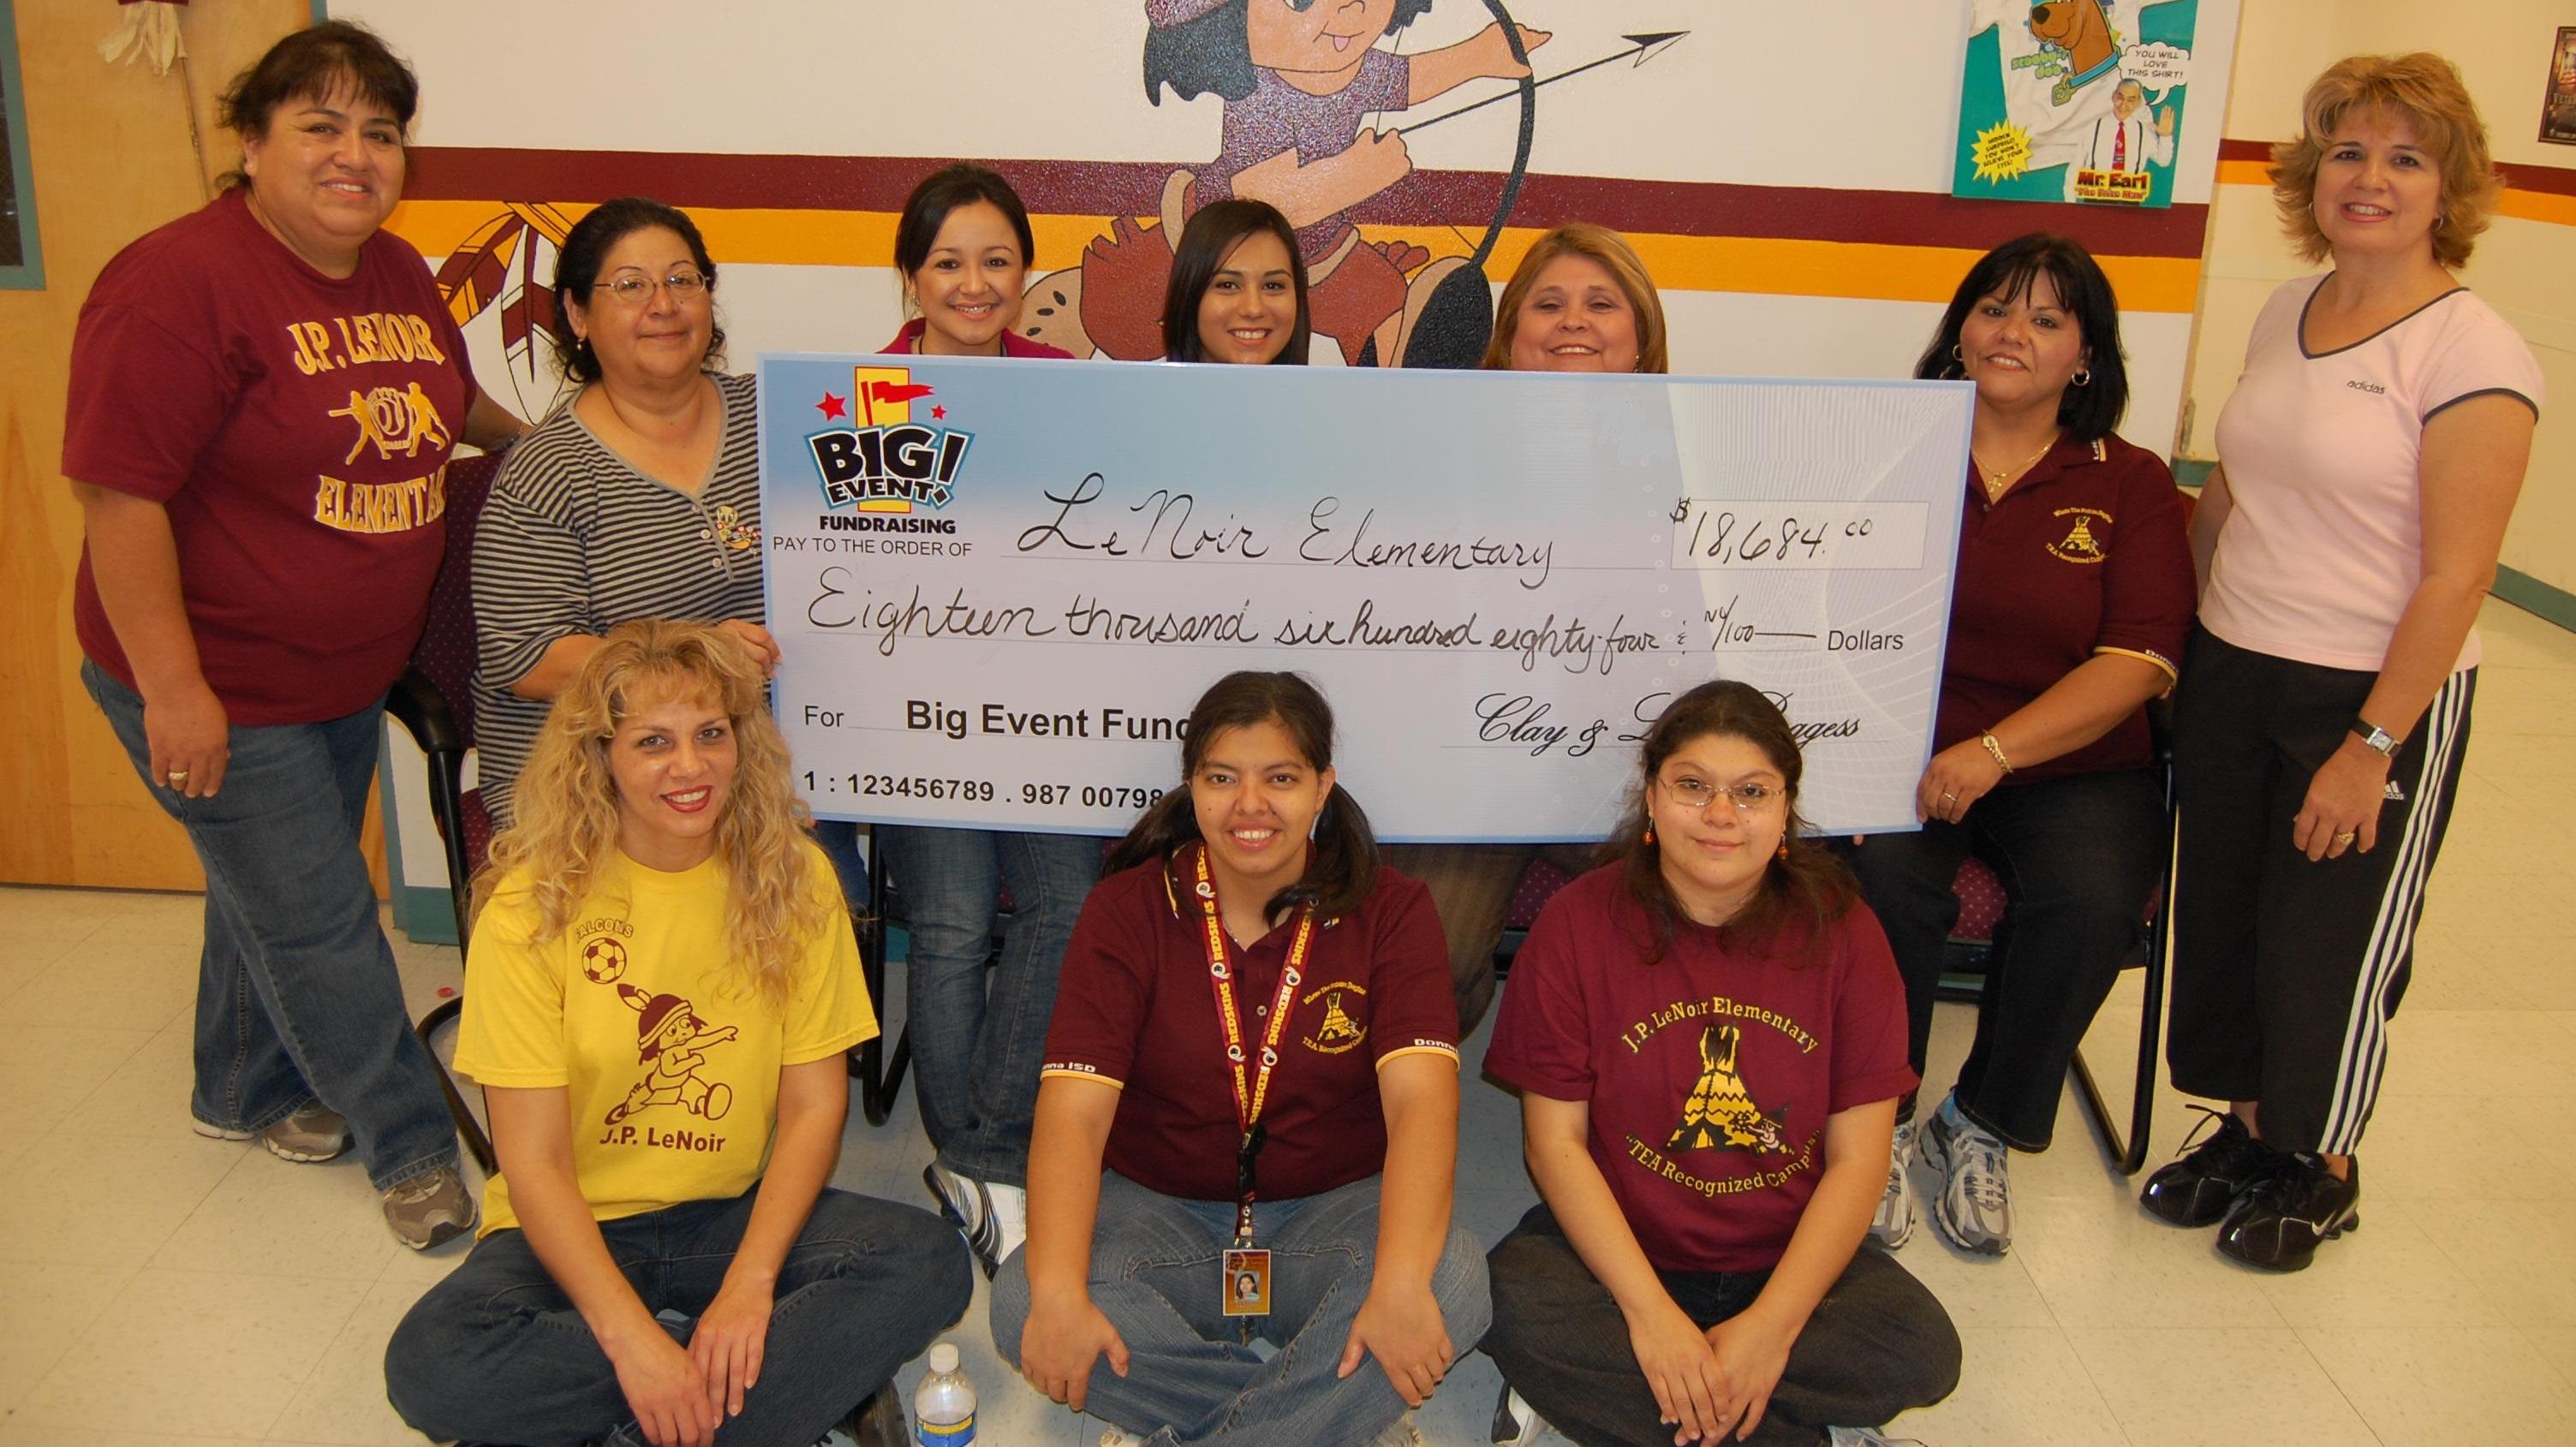 Le Noir Elementary School fundraising team holding check